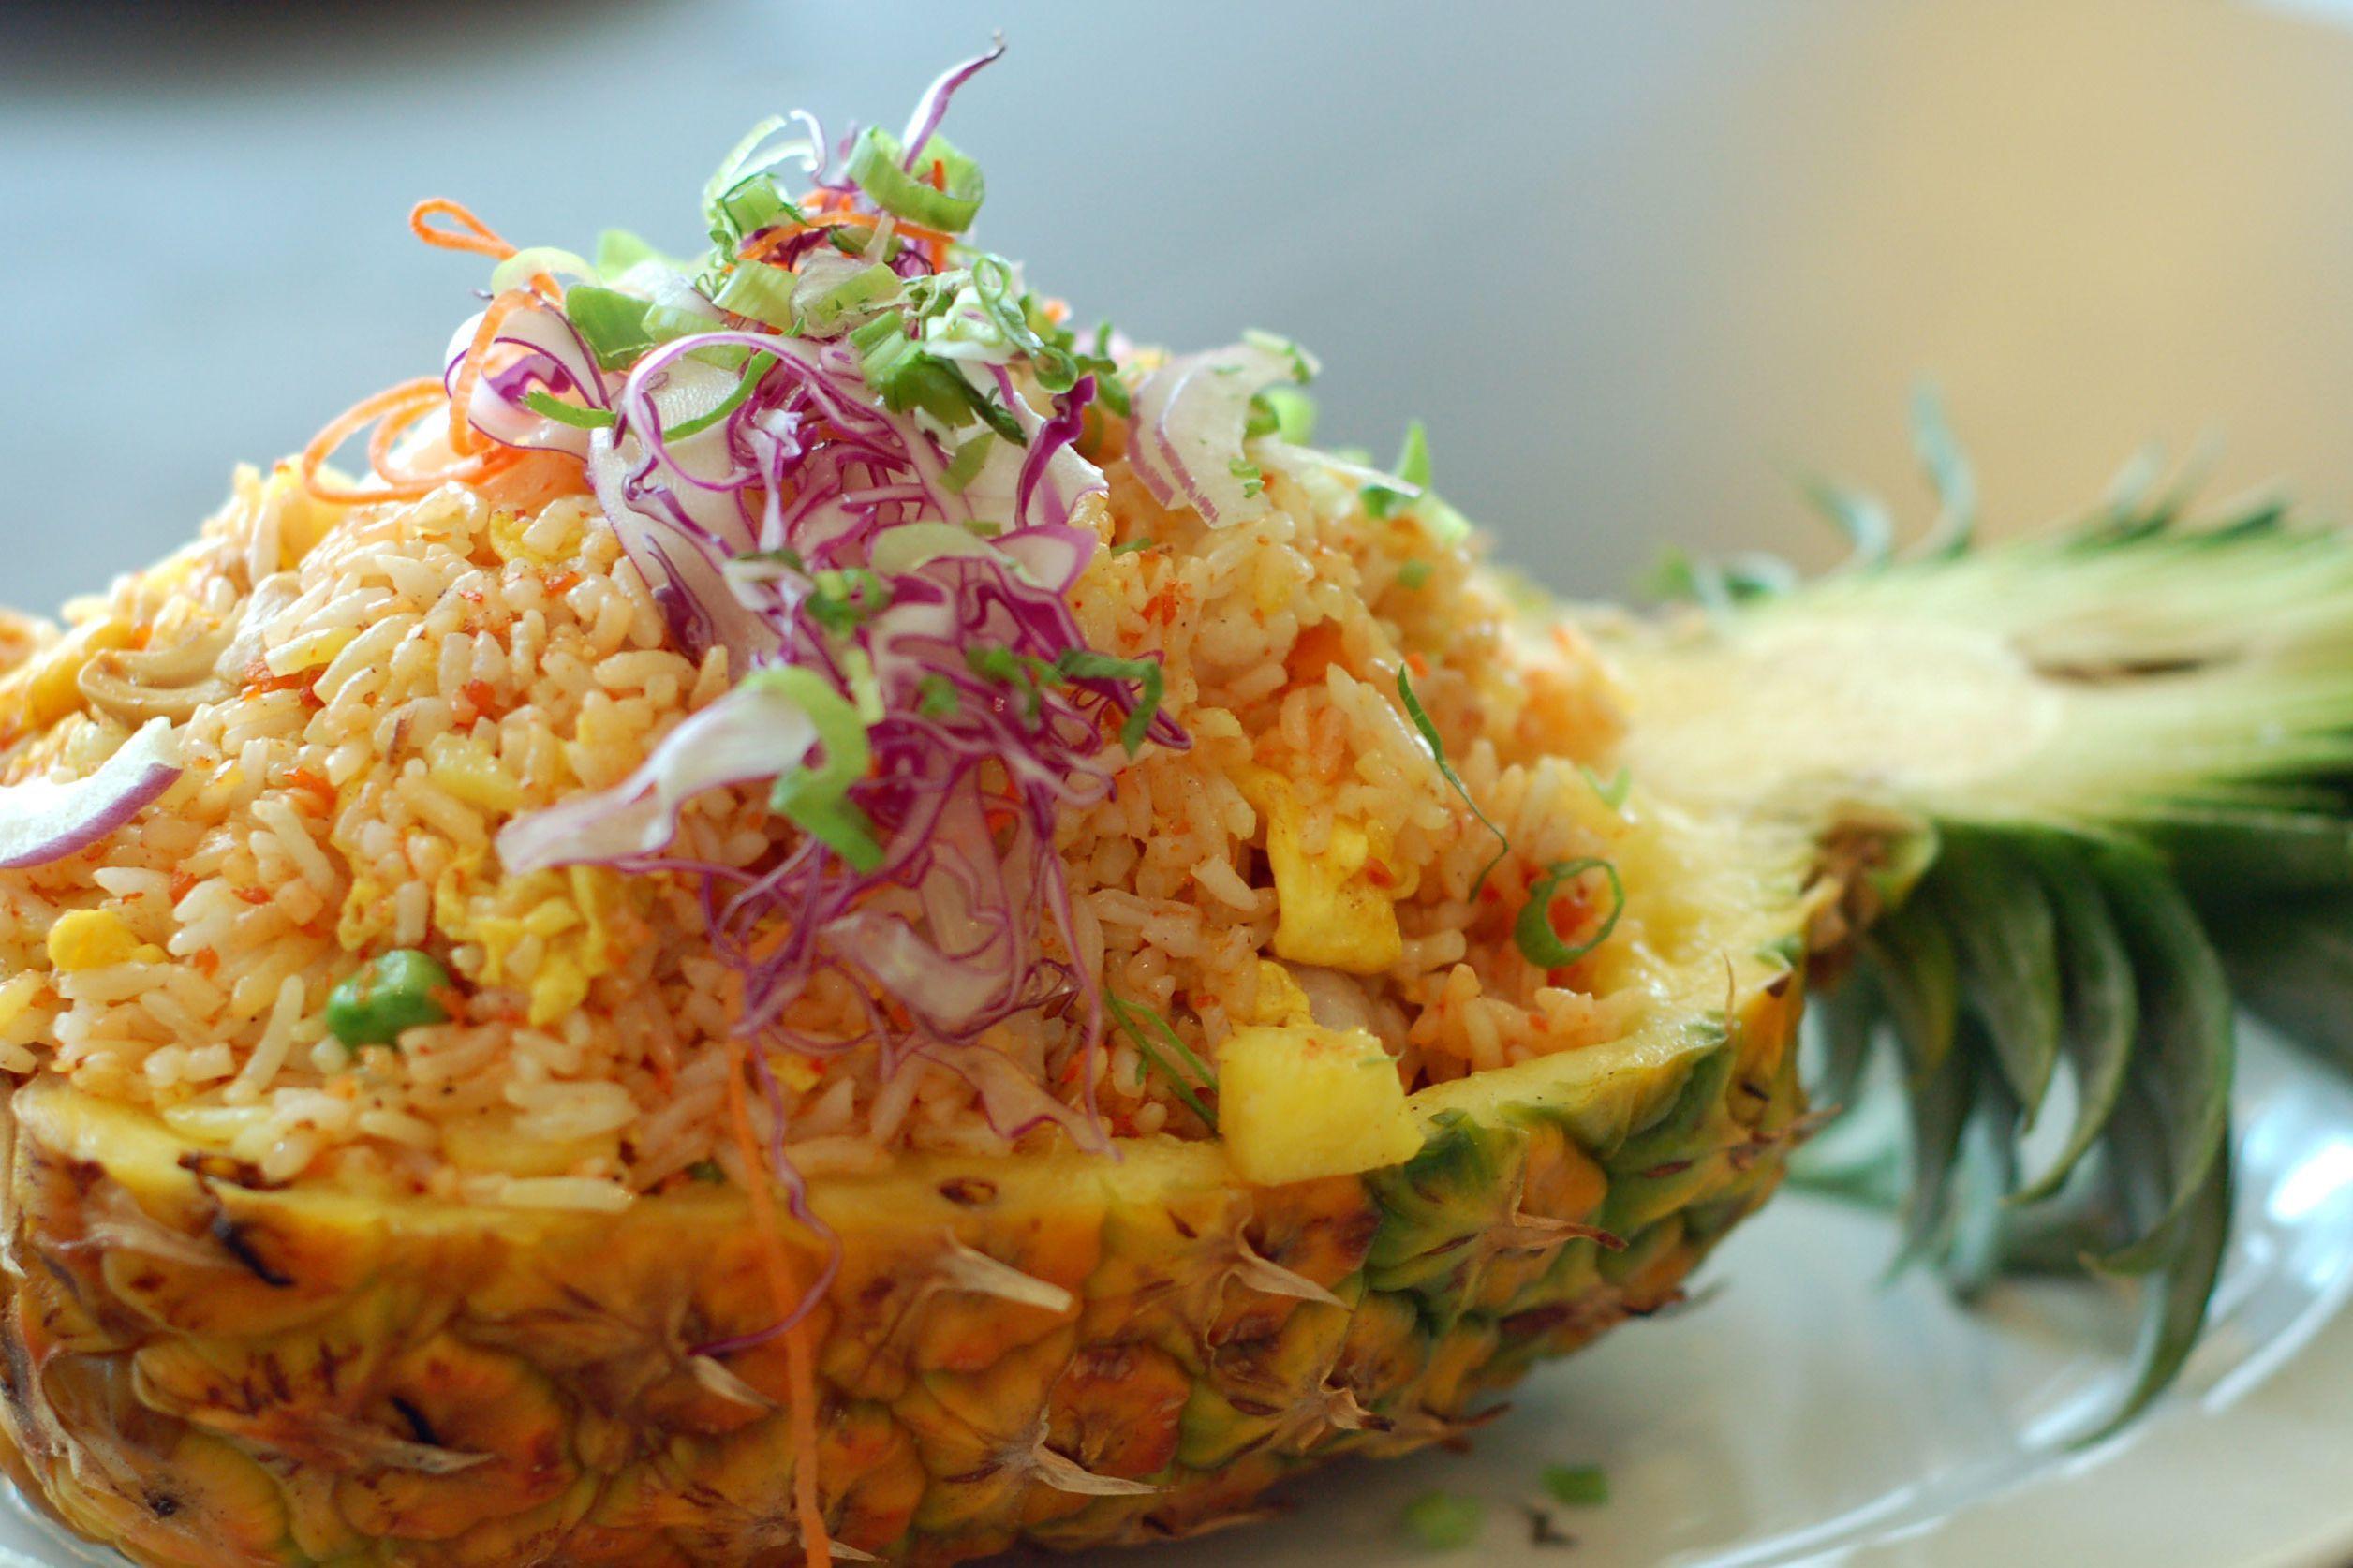 Thai vegetarian pineapple fried rice recipe thai pineapple fried food this classic thai pineapple fried rice recipe is real vegetarian forumfinder Choice Image